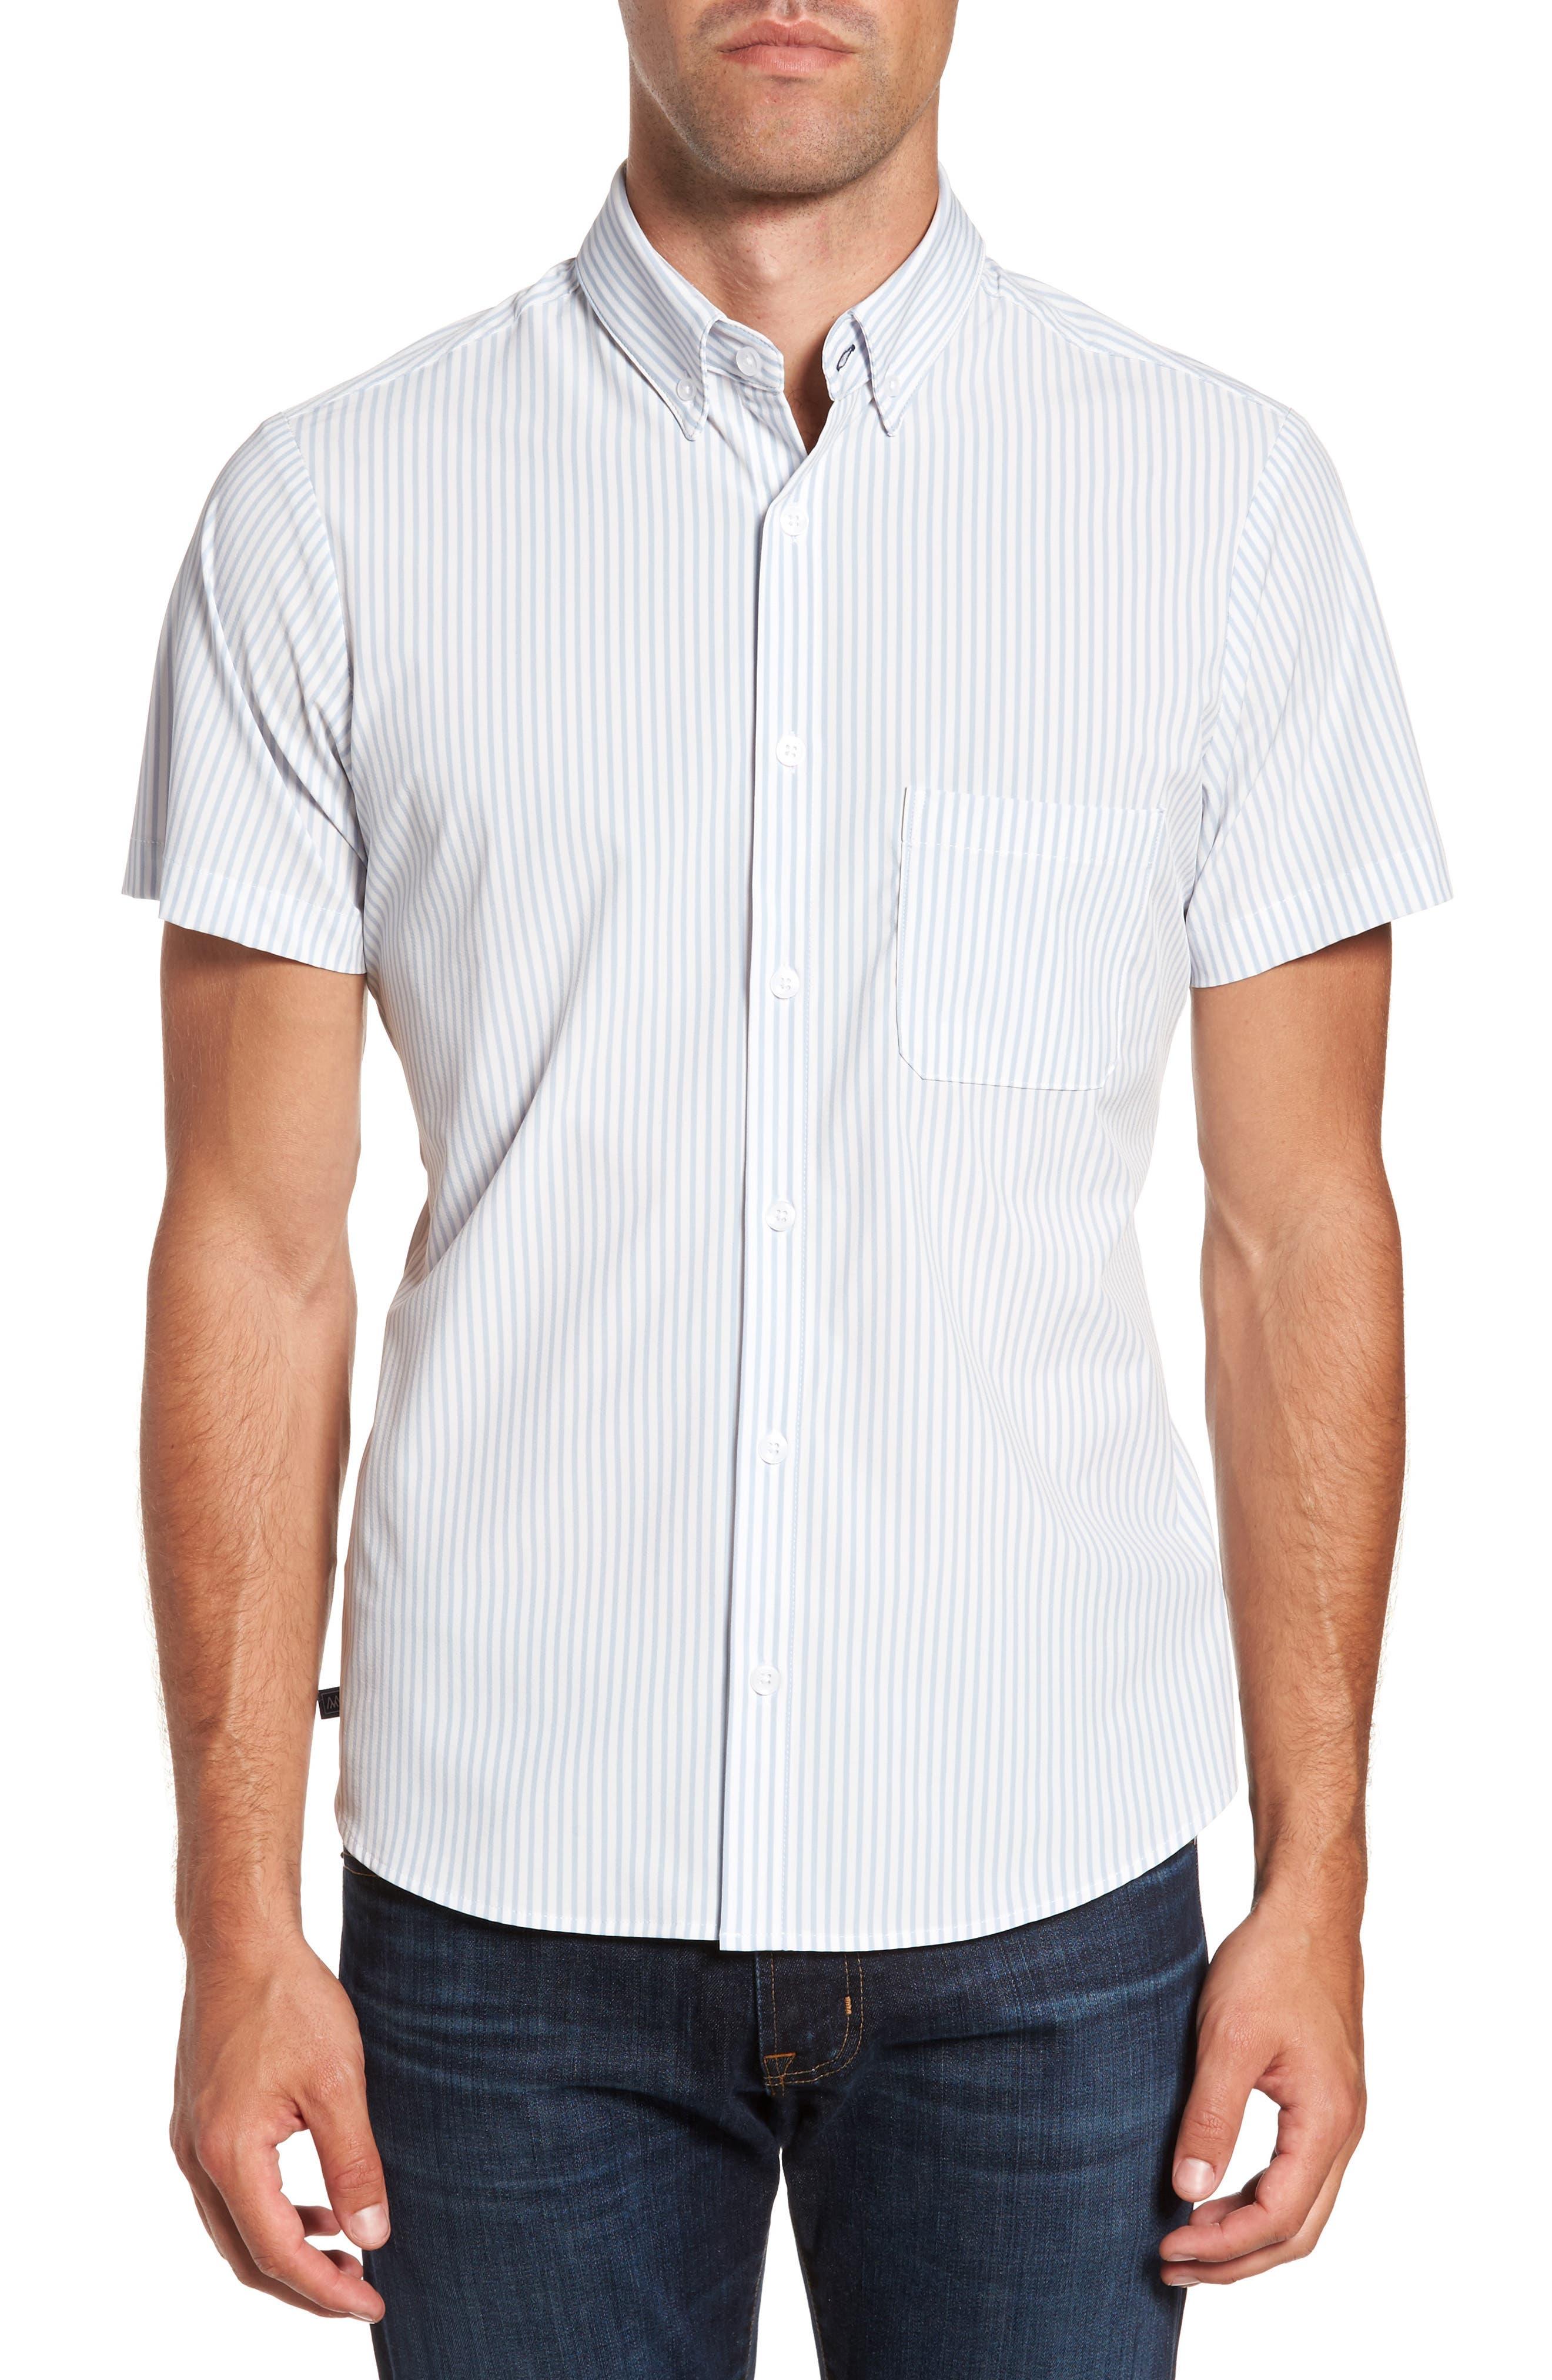 St. Elias Stripe Sport Shirt,                         Main,                         color, 100